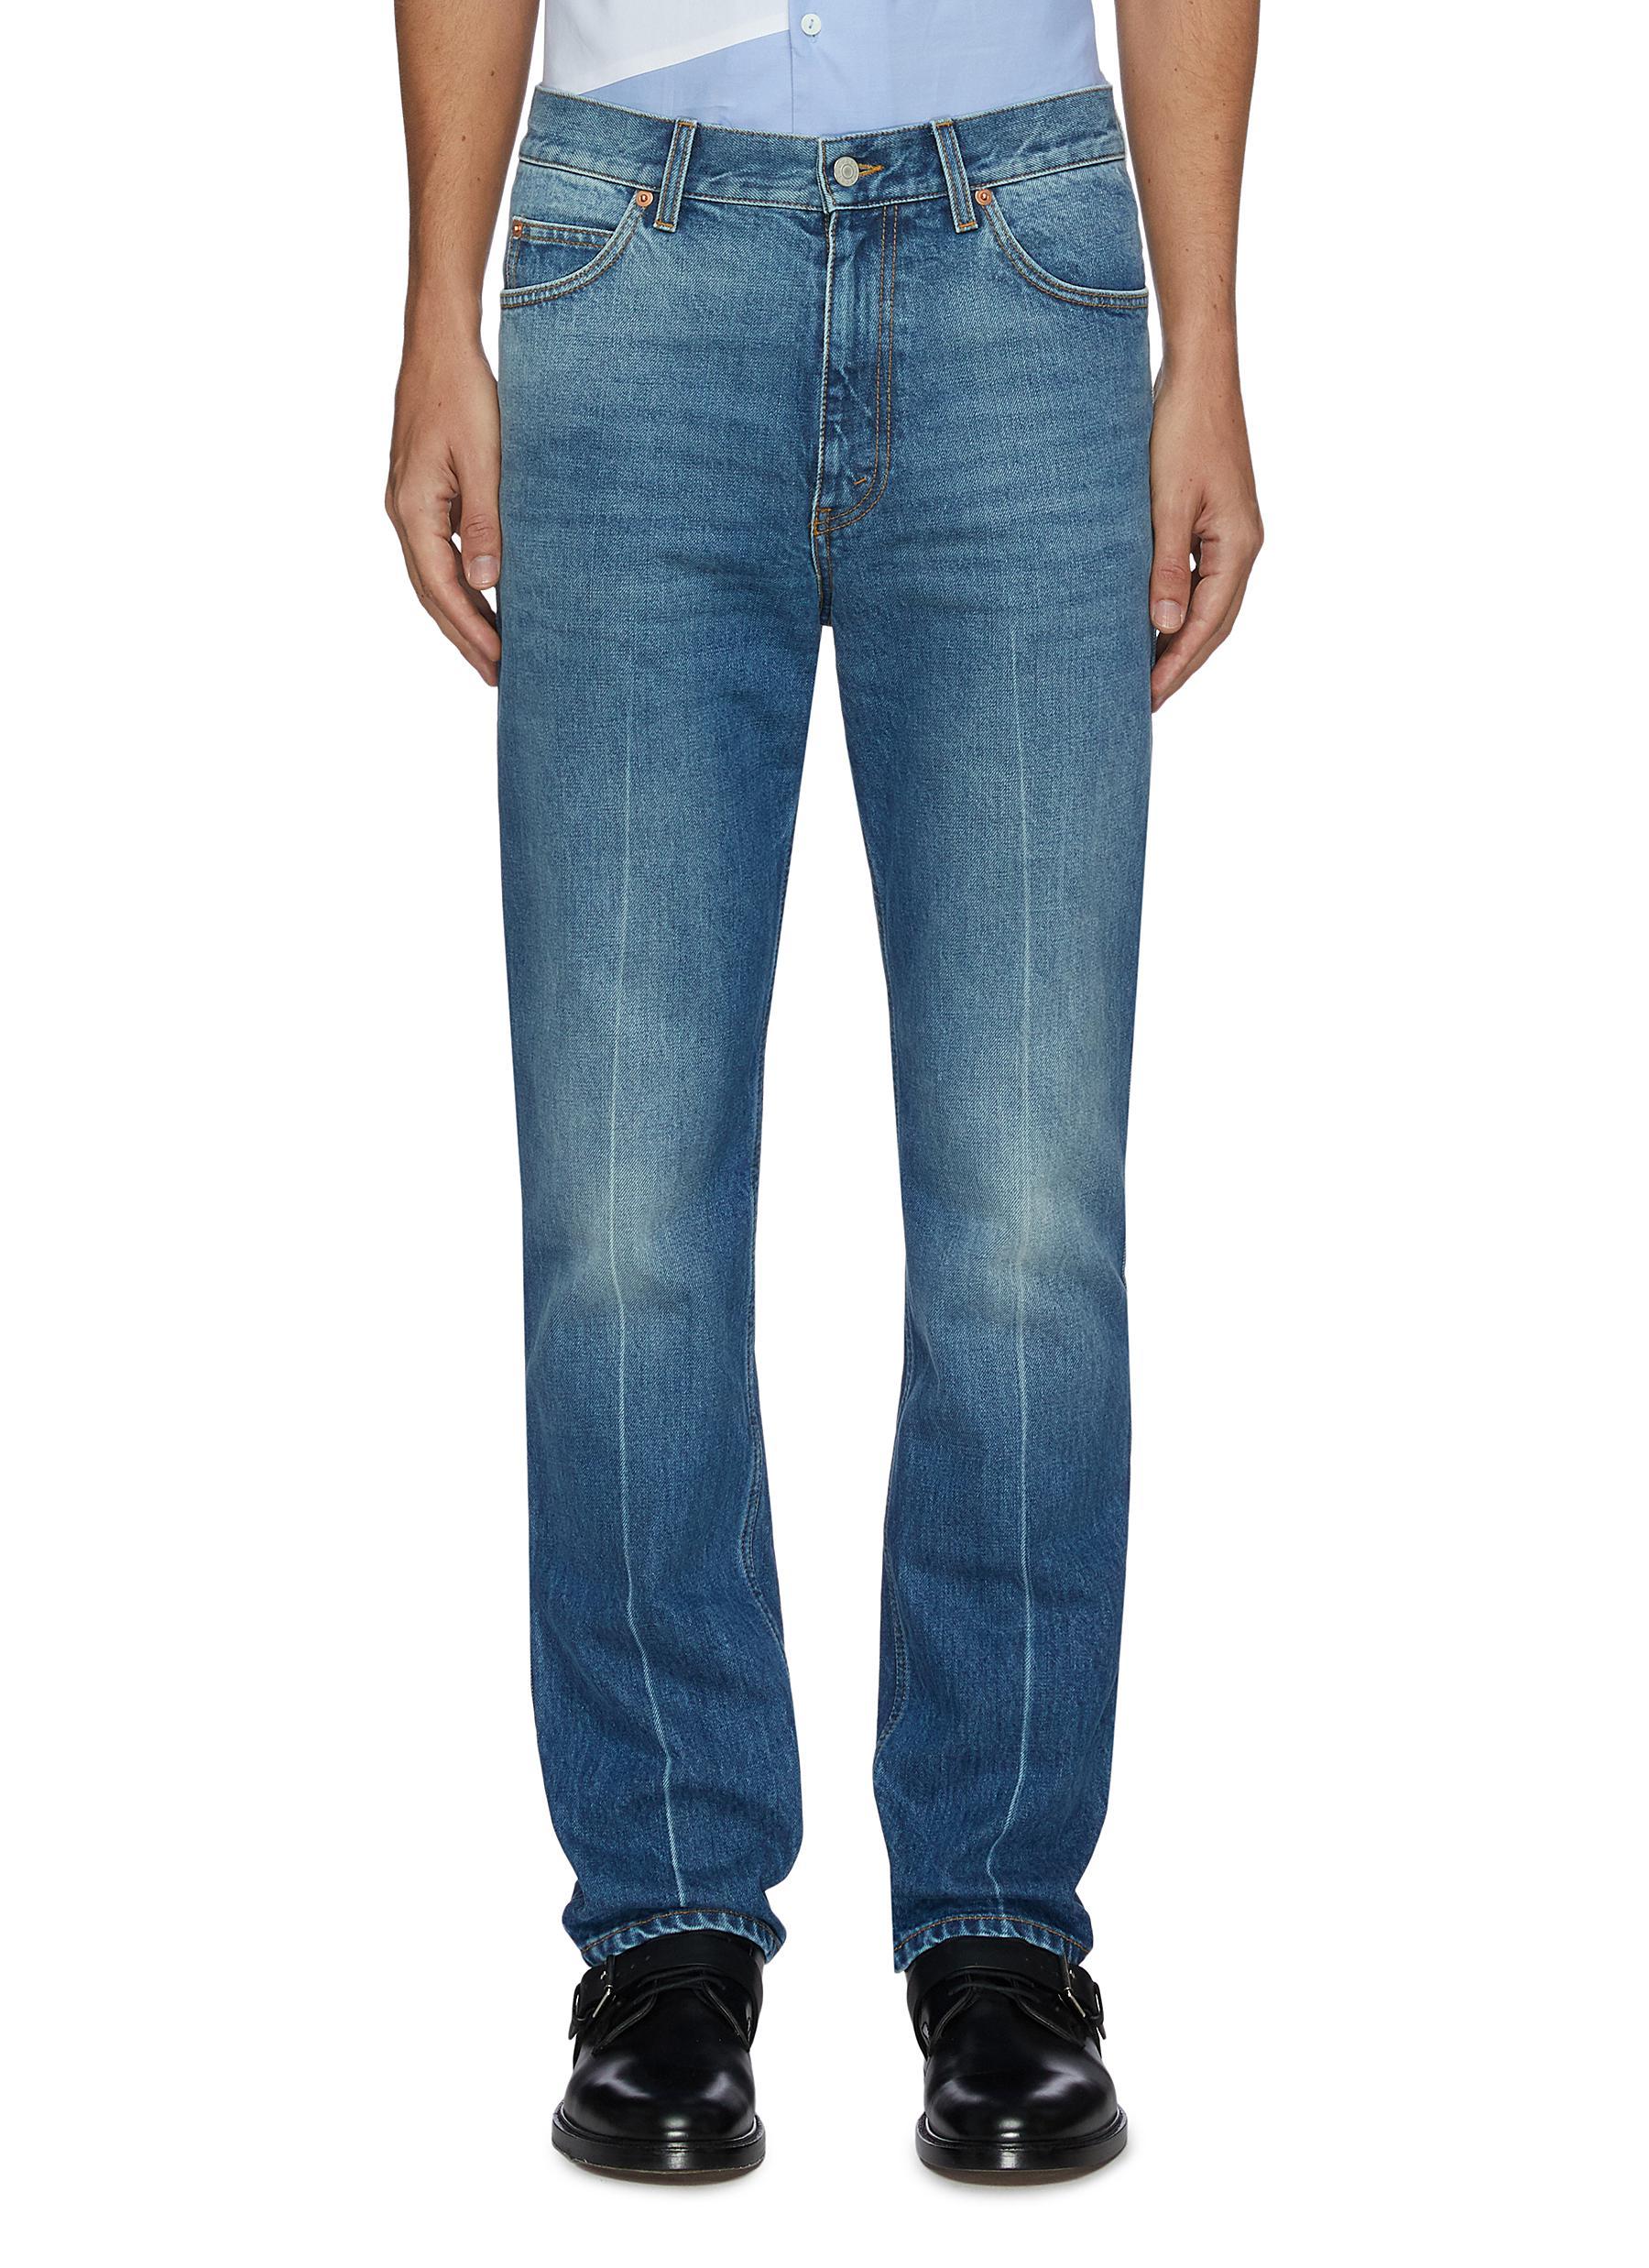 Marble wash fold jeans - GUCCI - Modalova